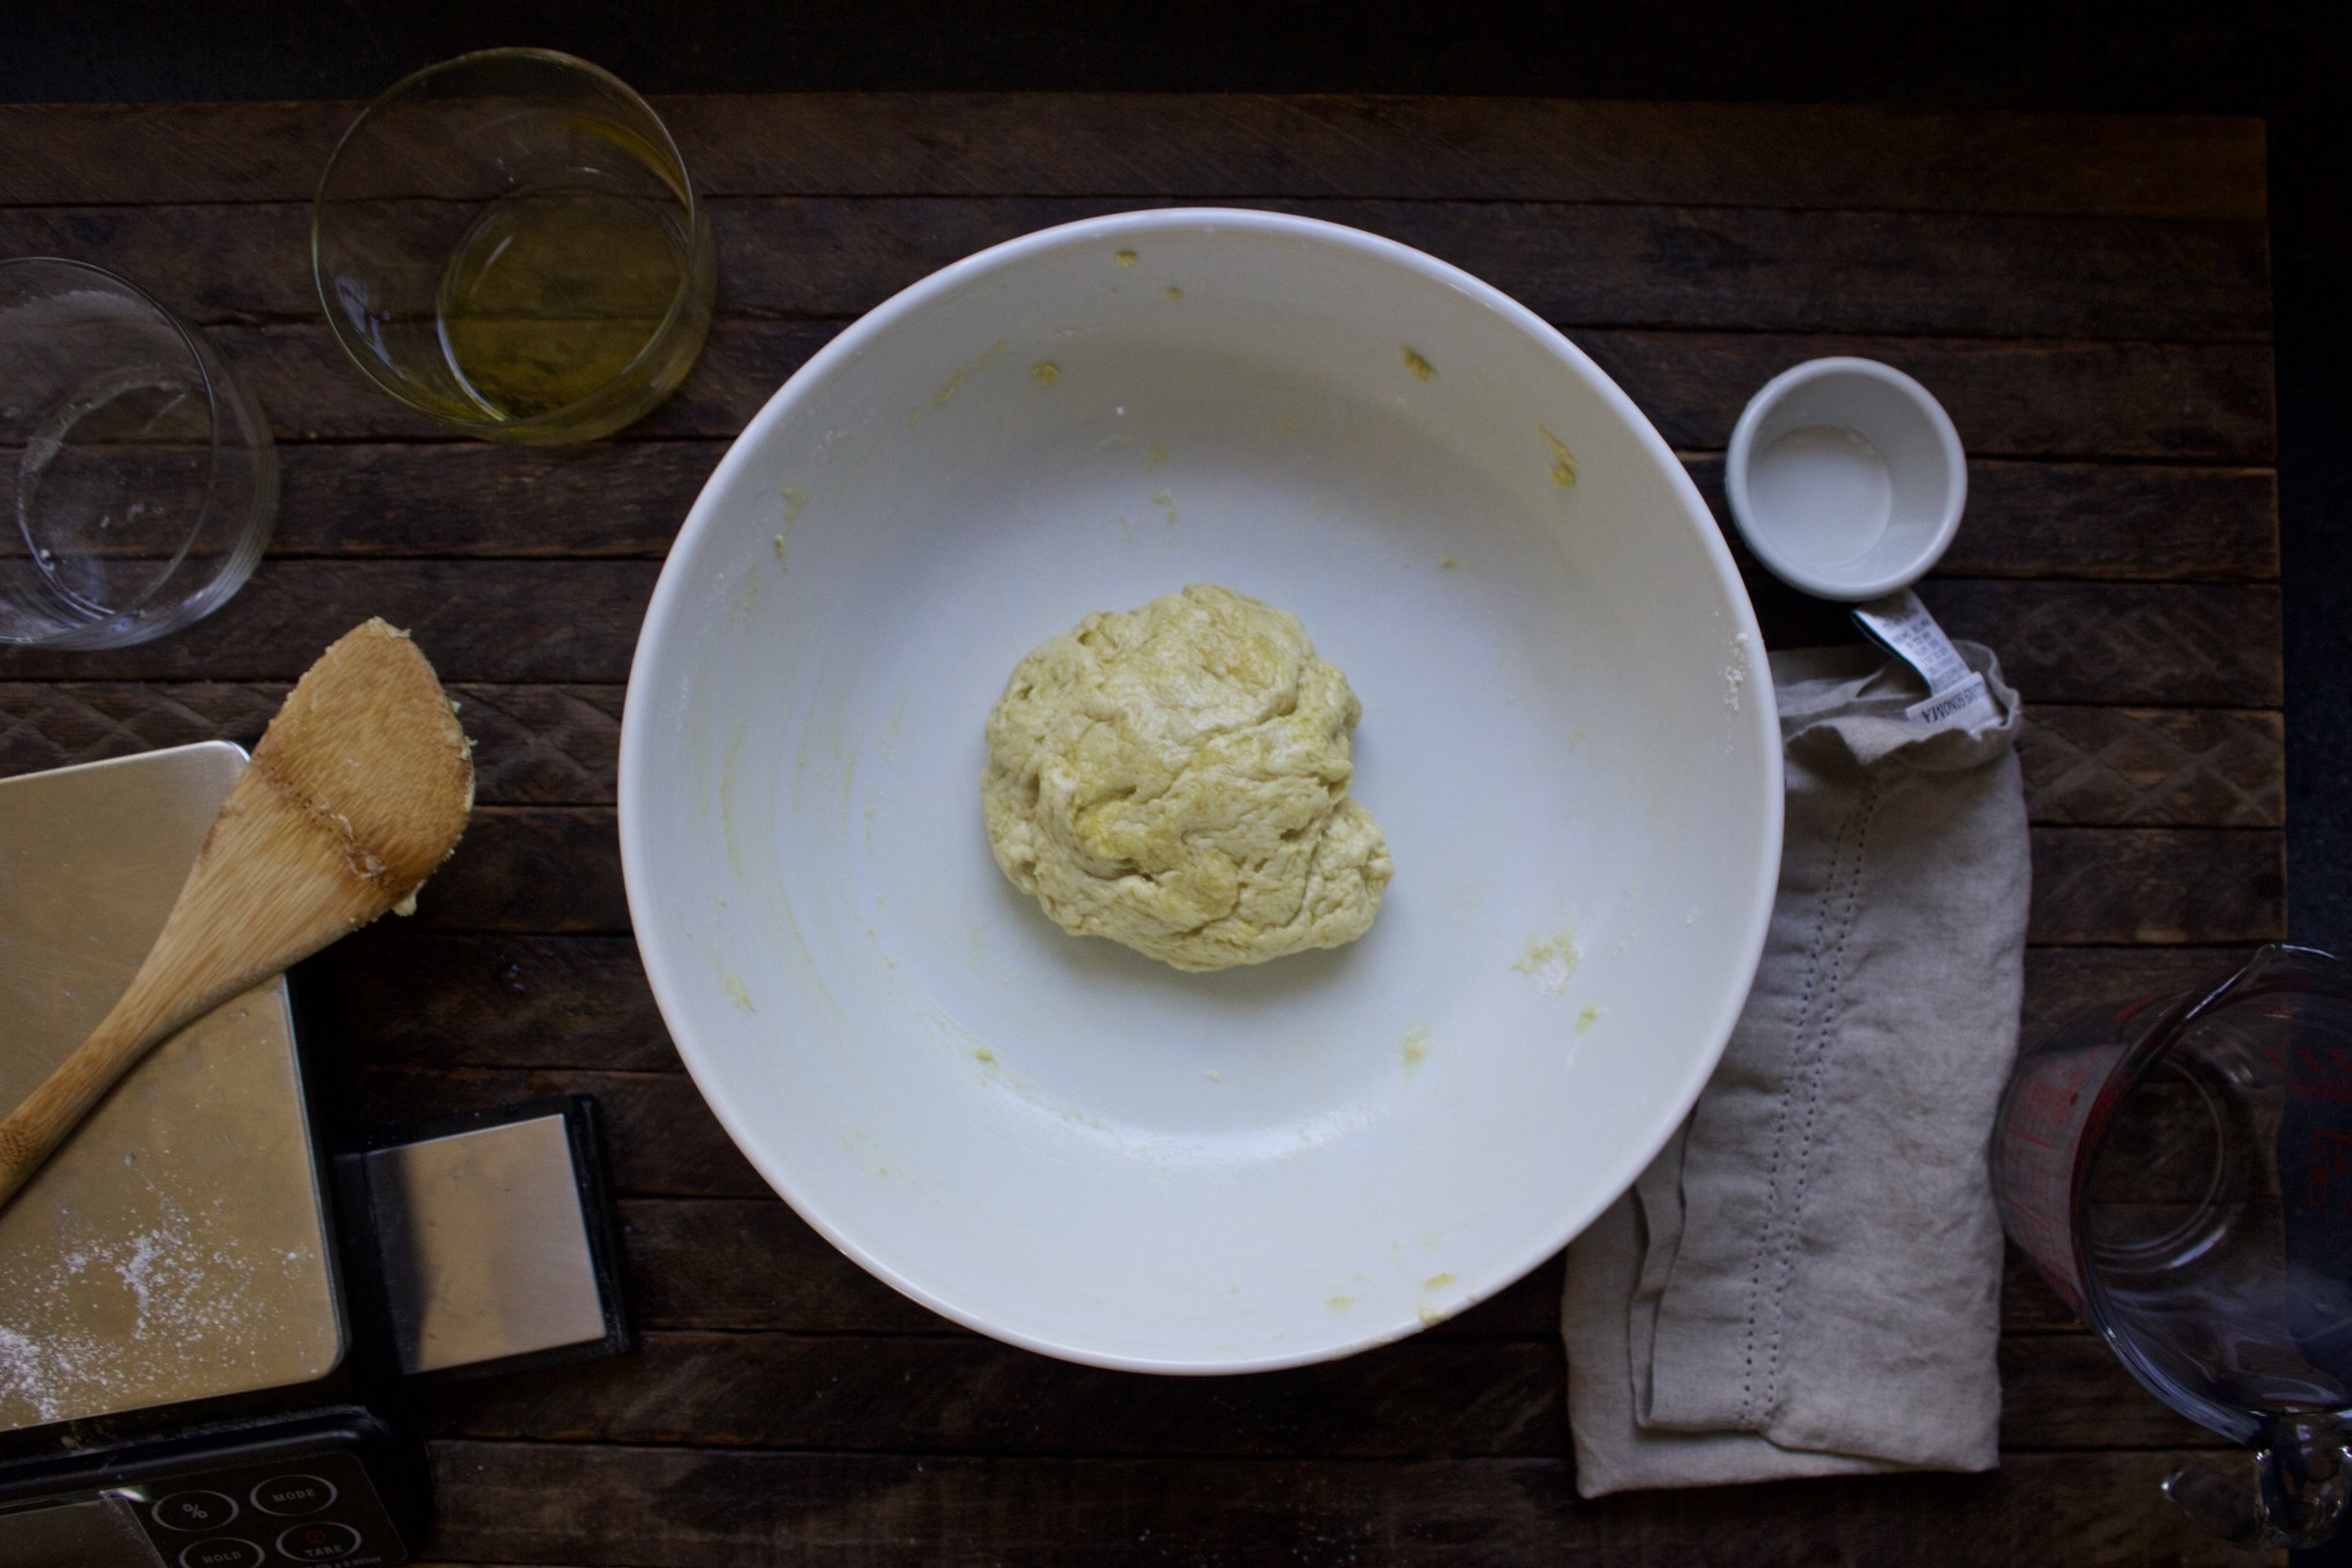 olive oil tortas dough